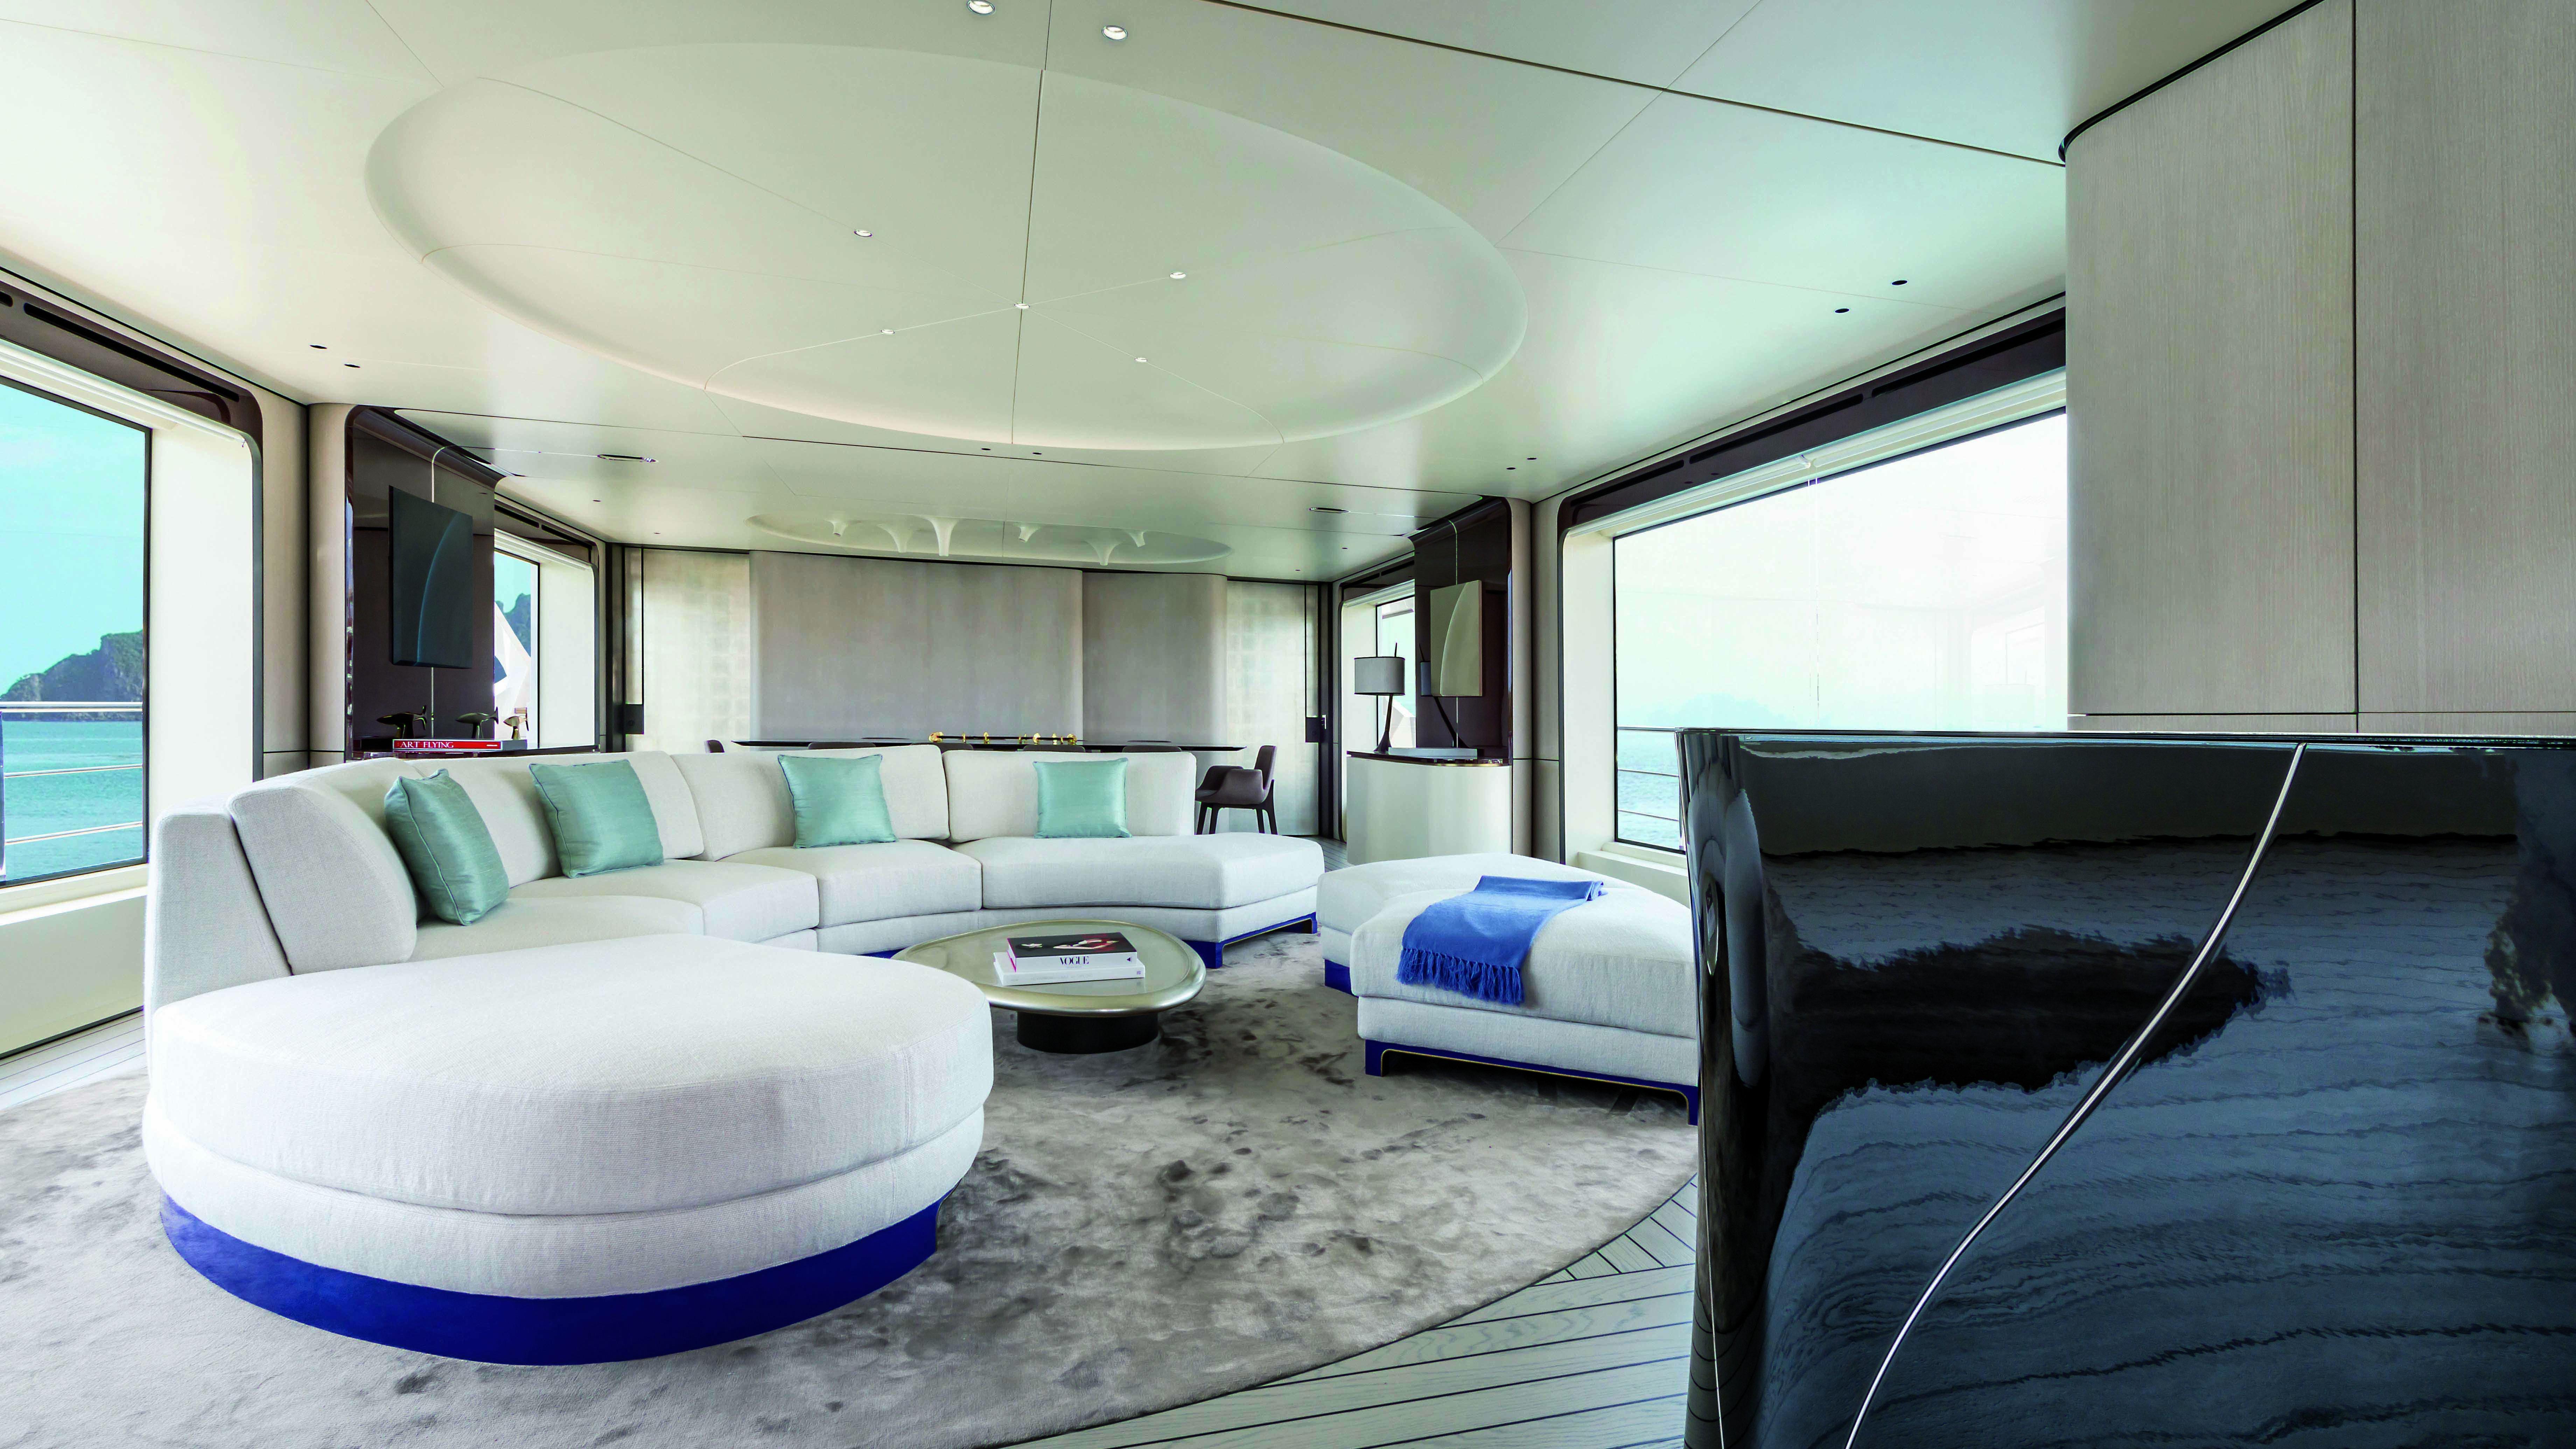 Achille Salvagni Azimut Grande 35 Metri Italian yacht